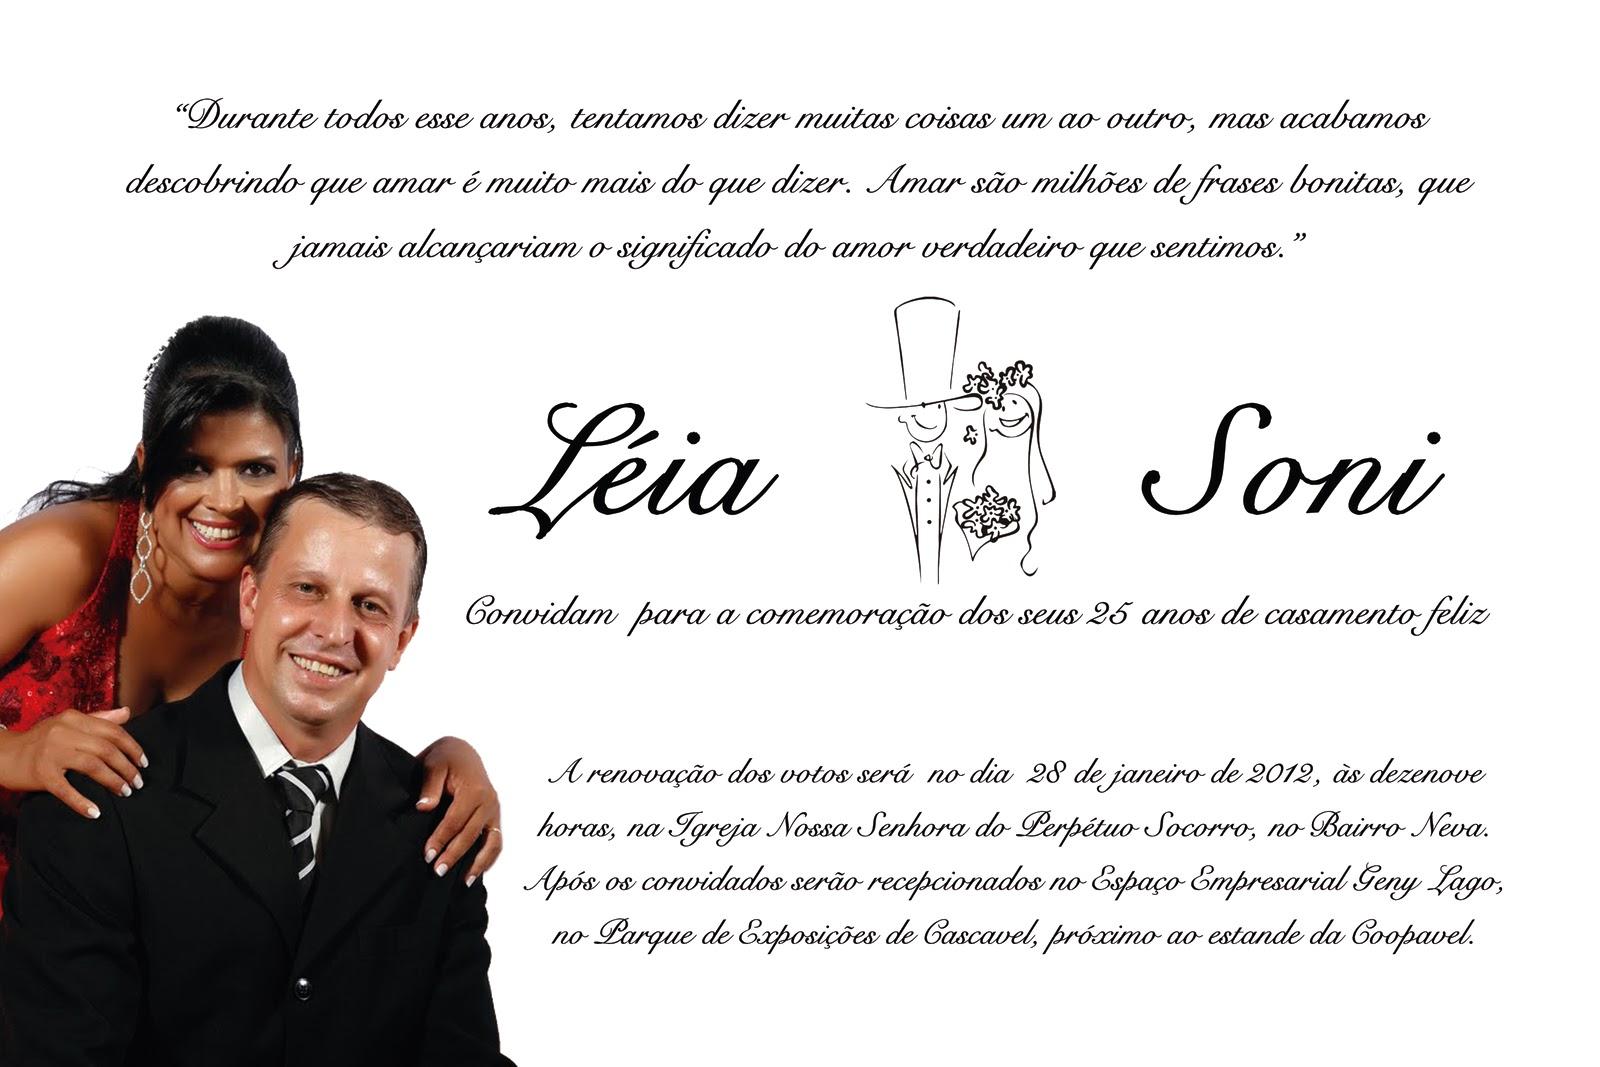 Requinte Convites Personalizados Convite Casamento Bodas De Prata